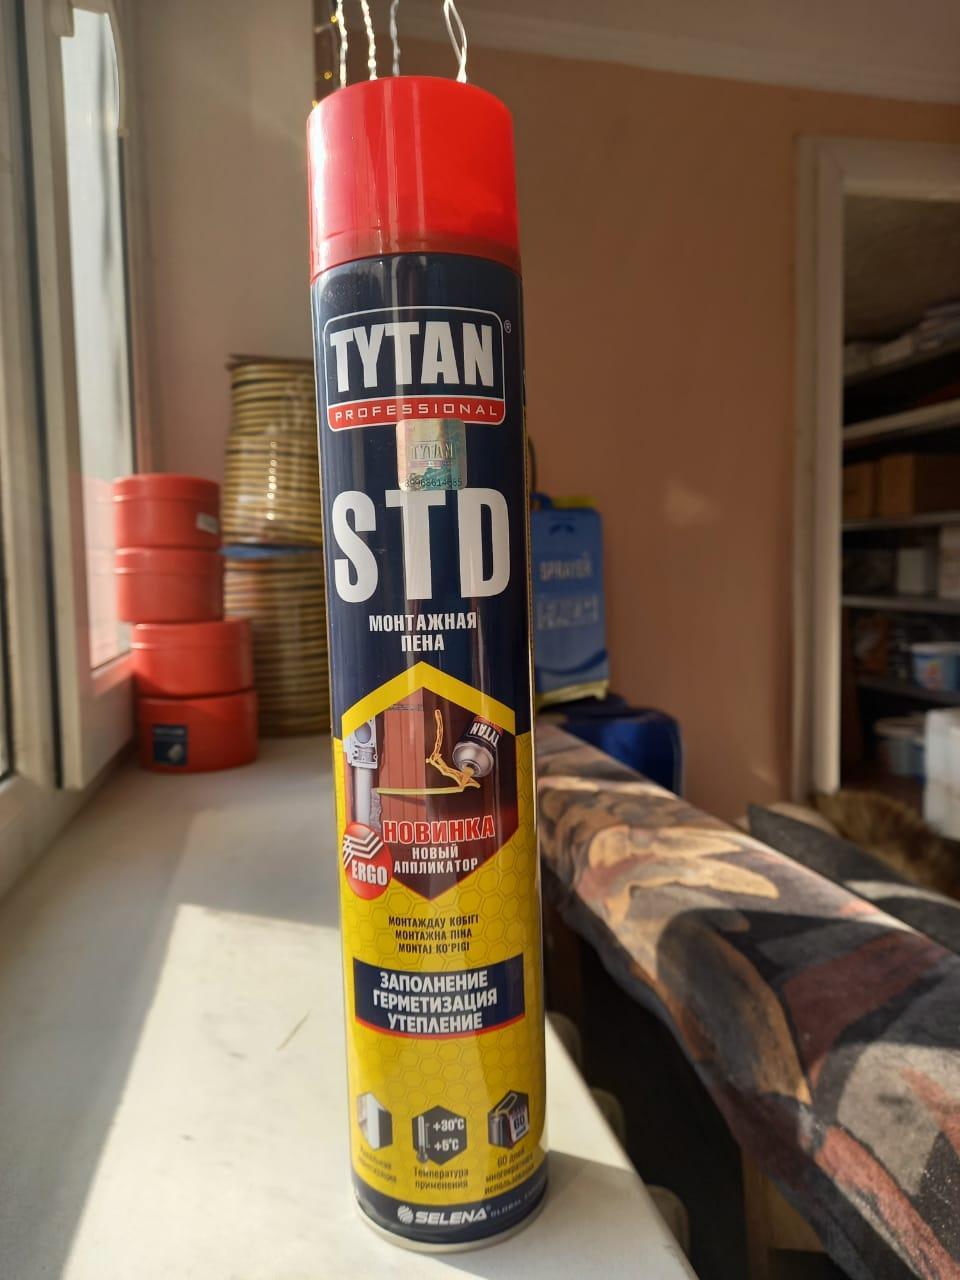 Пена монтажная STD О2 750мл/ TYTAN